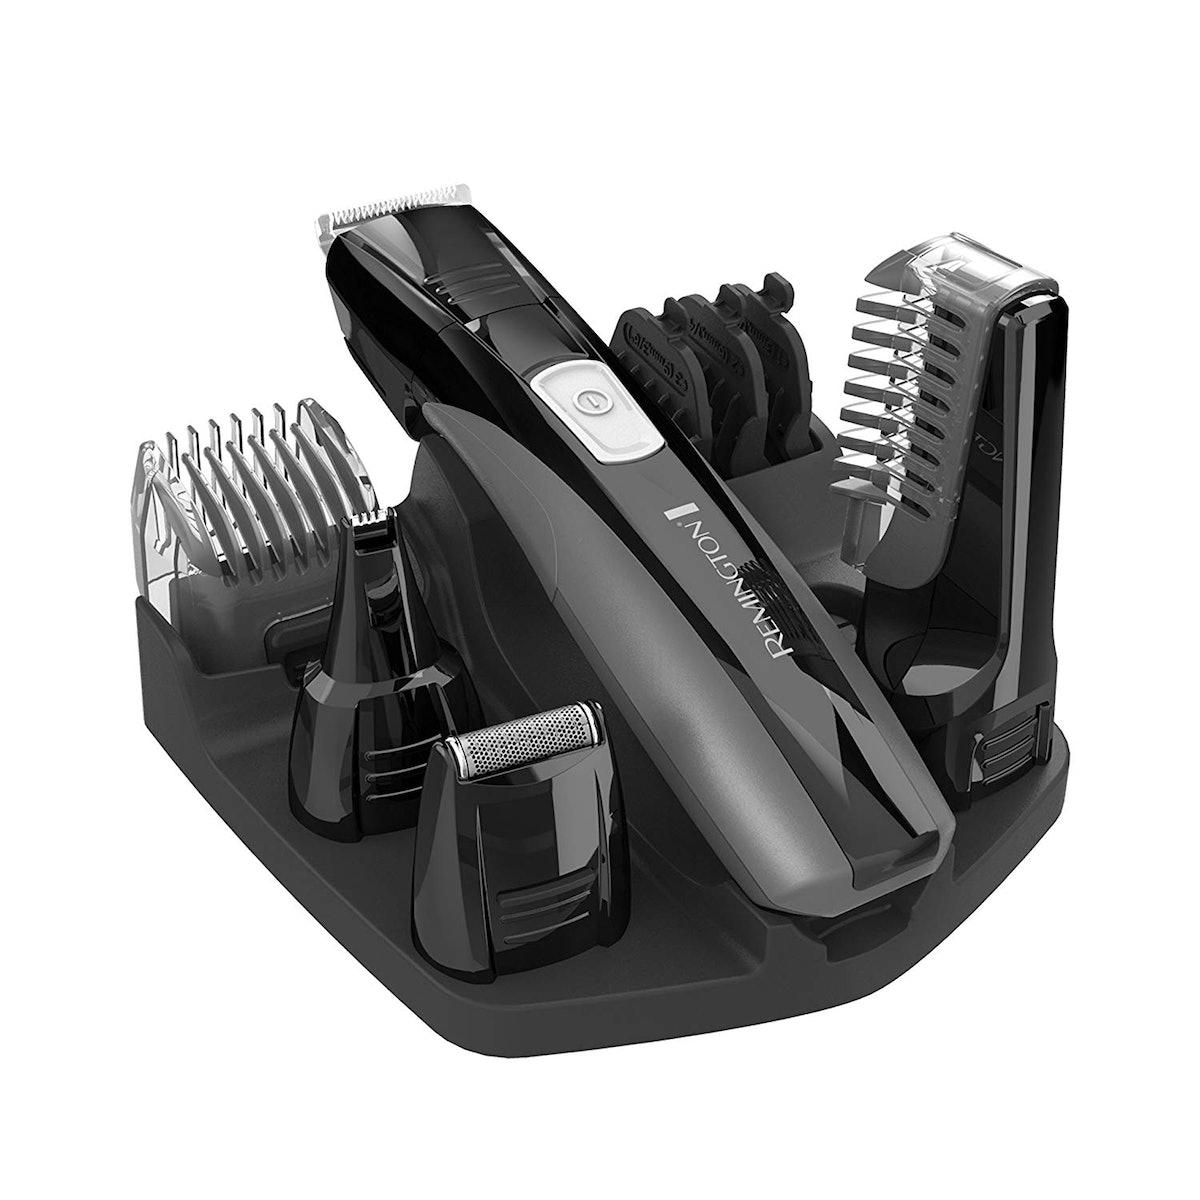 Remington PG525 Lithium Powered Body Groomer Kit,